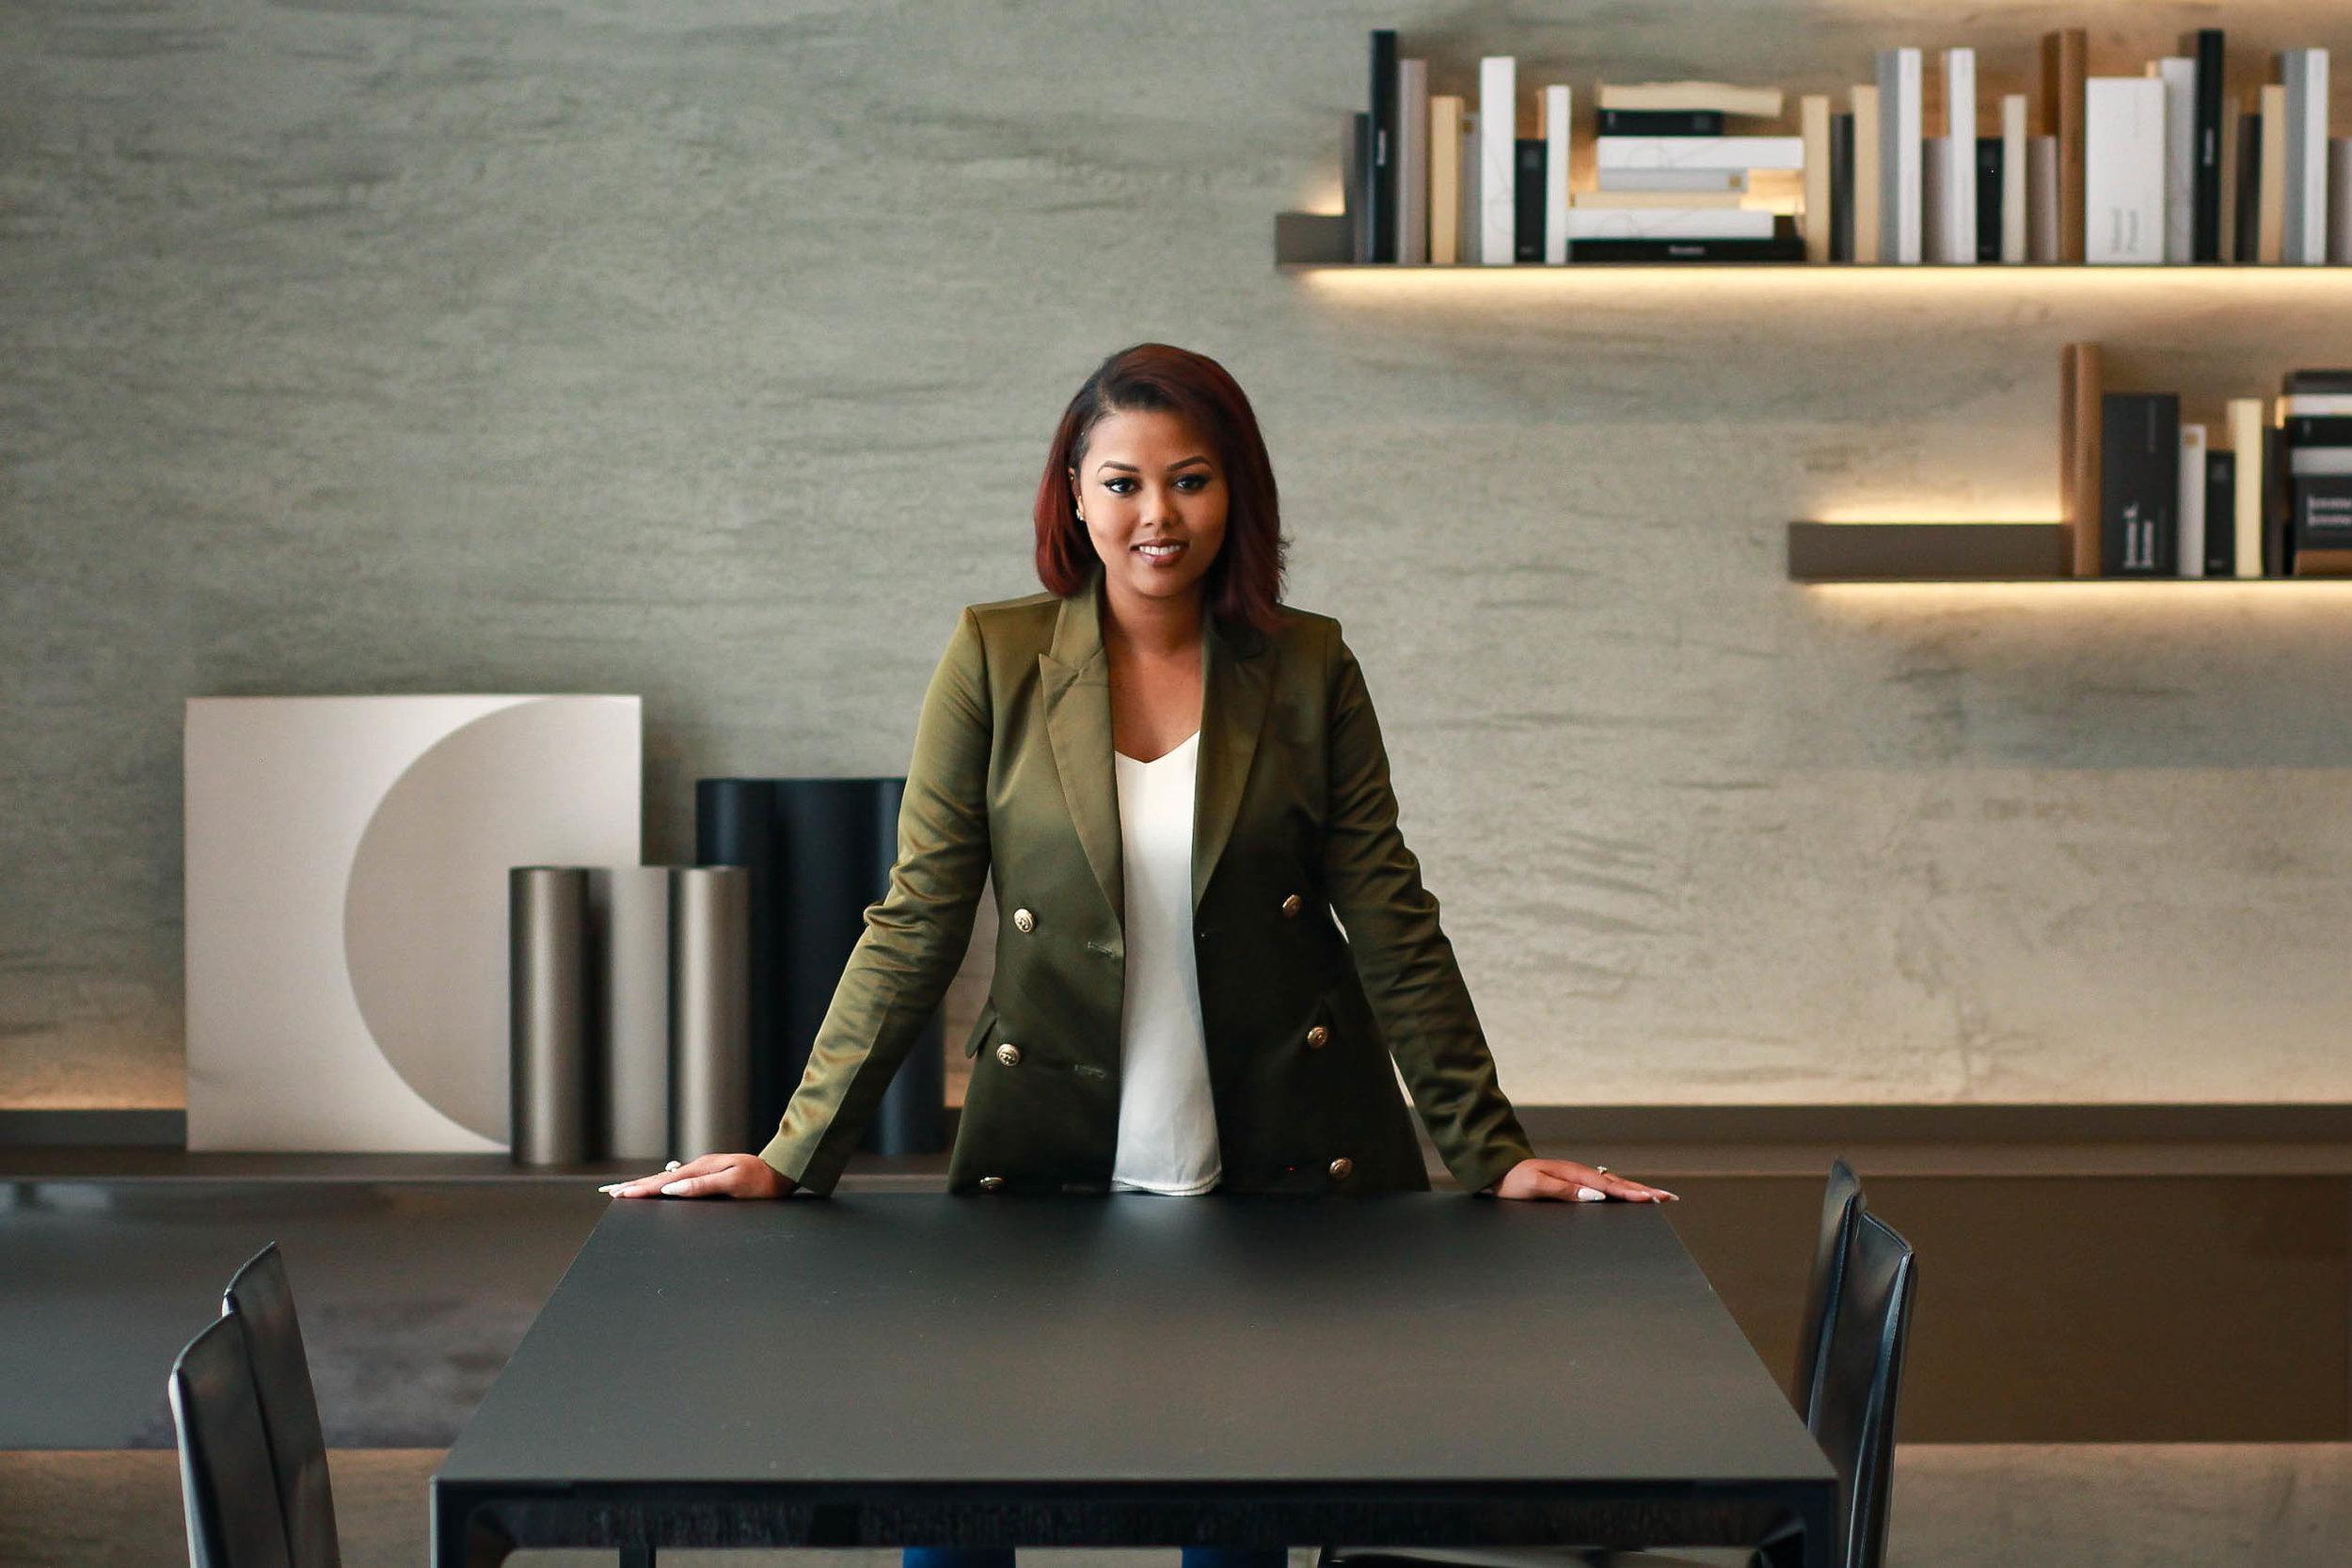 Alyssa CEO/Founder Session